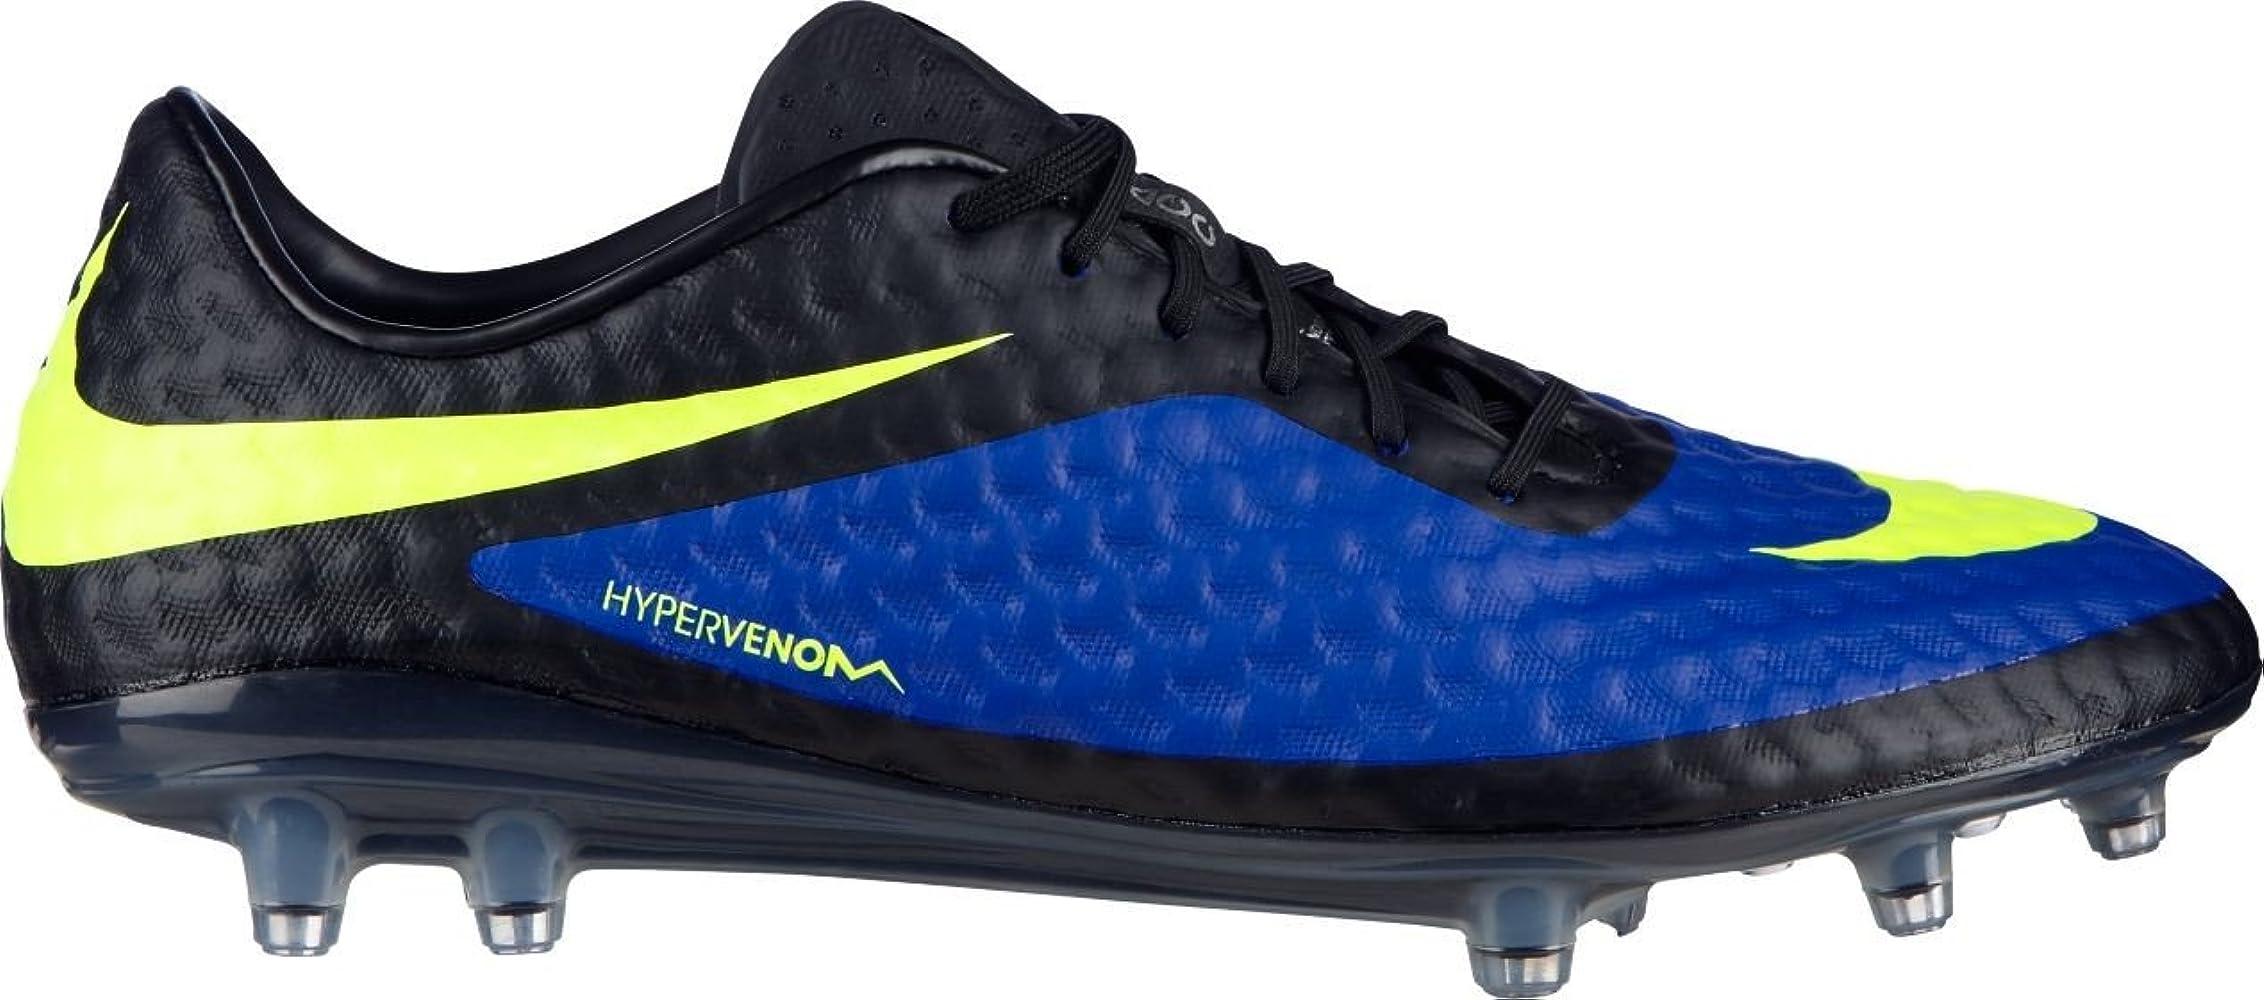 Vacío eficiencia Capitán Brie  Amazon.com | Nike Hypervenom Phantom FG Mens Football Boots 599843 470  Soccer Cleats Firm Ground (UK 7 US 8 EU 41) | Soccer